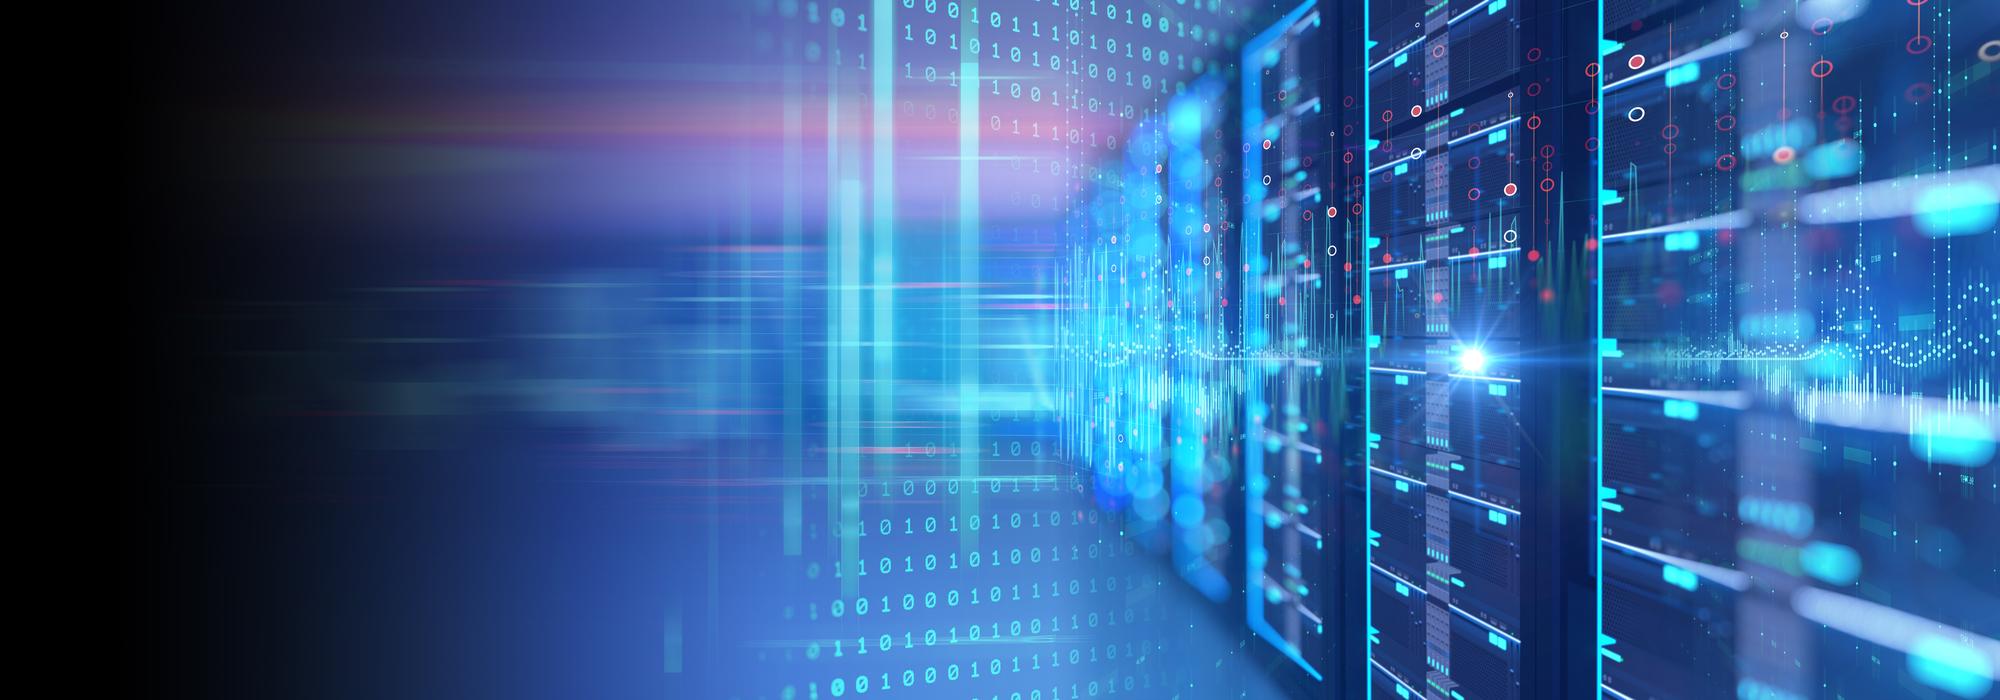 High speed data monitoring